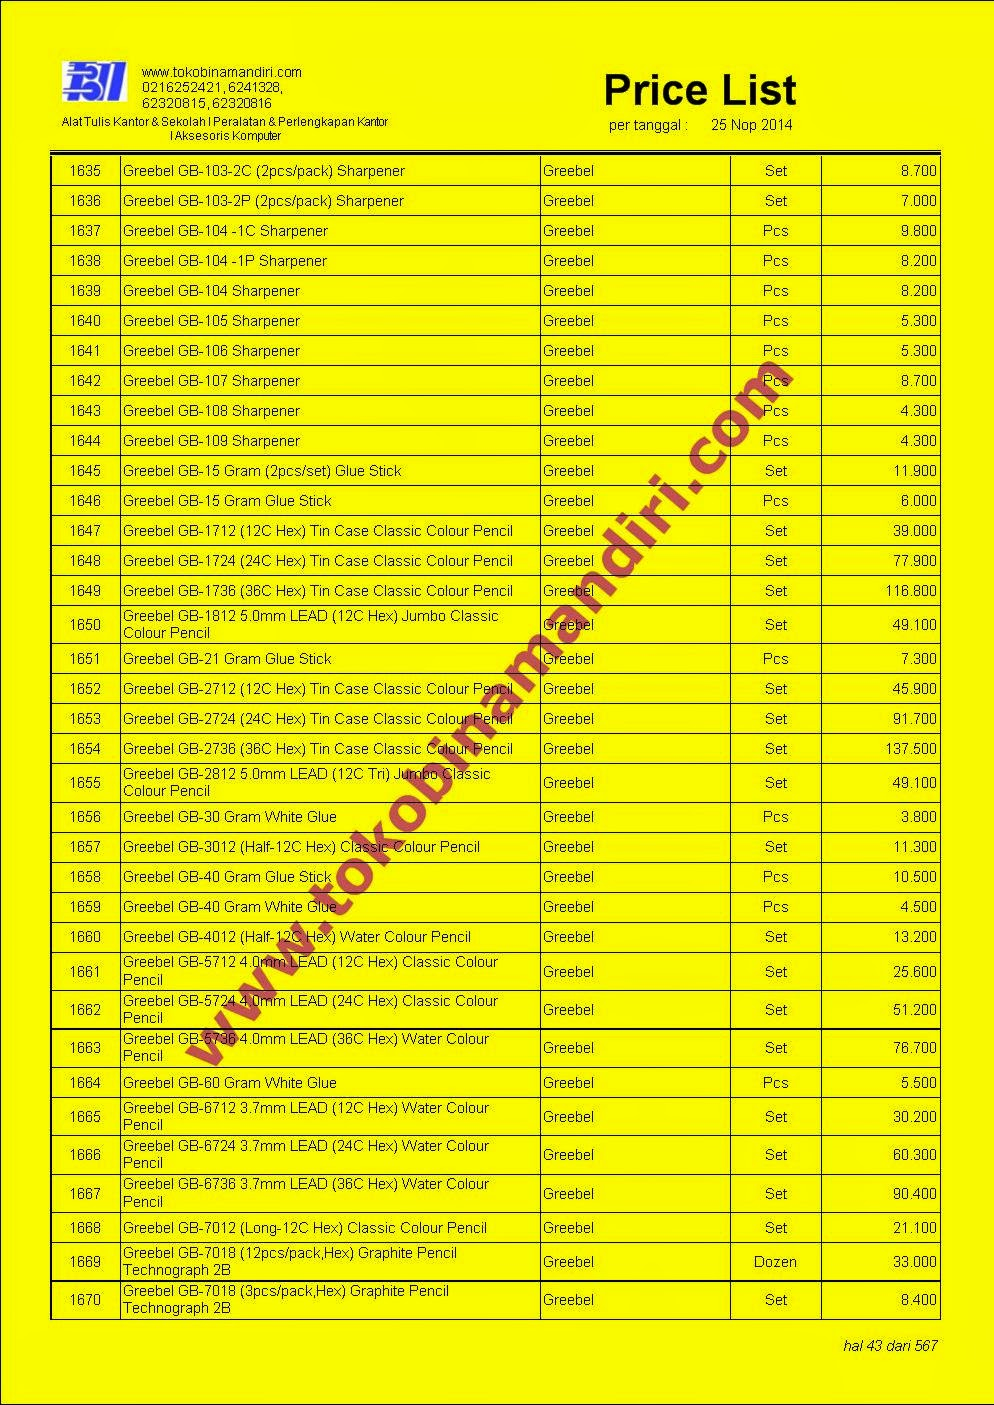 Daftar harga Stationery ATK Kantor juga disediakan oleh www.alattulis.co.id